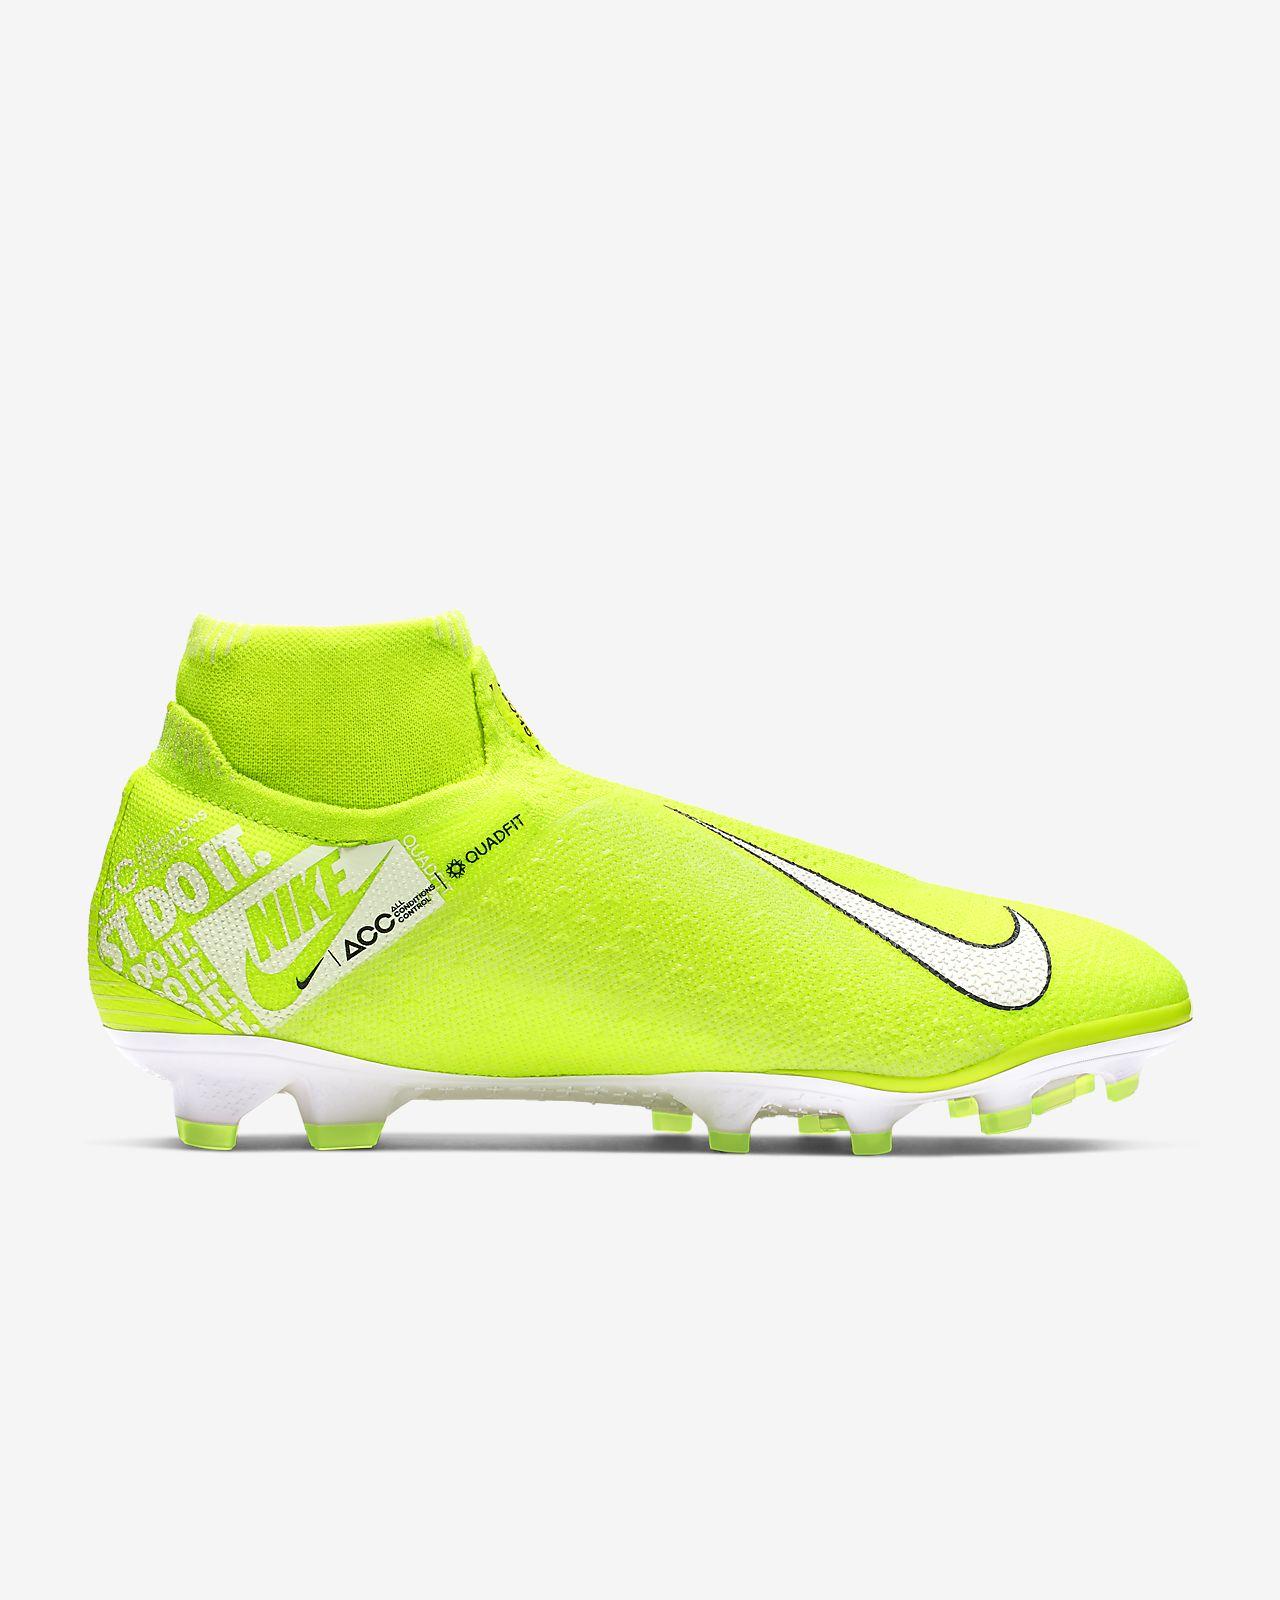 9868efd45f4 Nike Phantom Vision Elite Dynamic Fit FG Firm-Ground Soccer Cleat